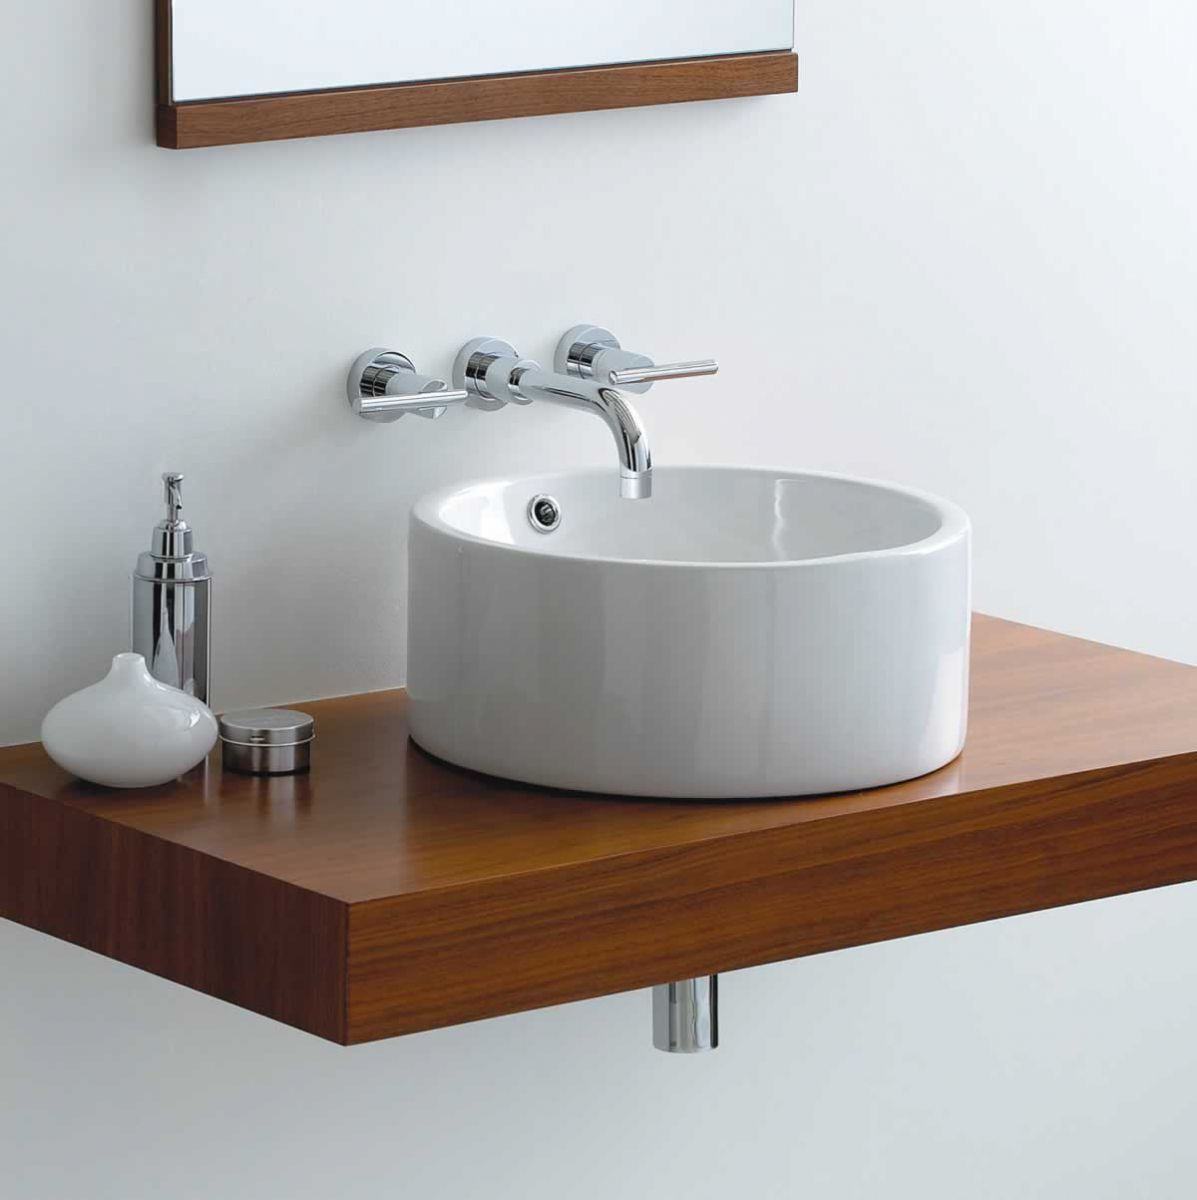 Bathroom Bowl Sink Ideas: Phoenix Susan Circular Counter Top Basin VB003. From Www